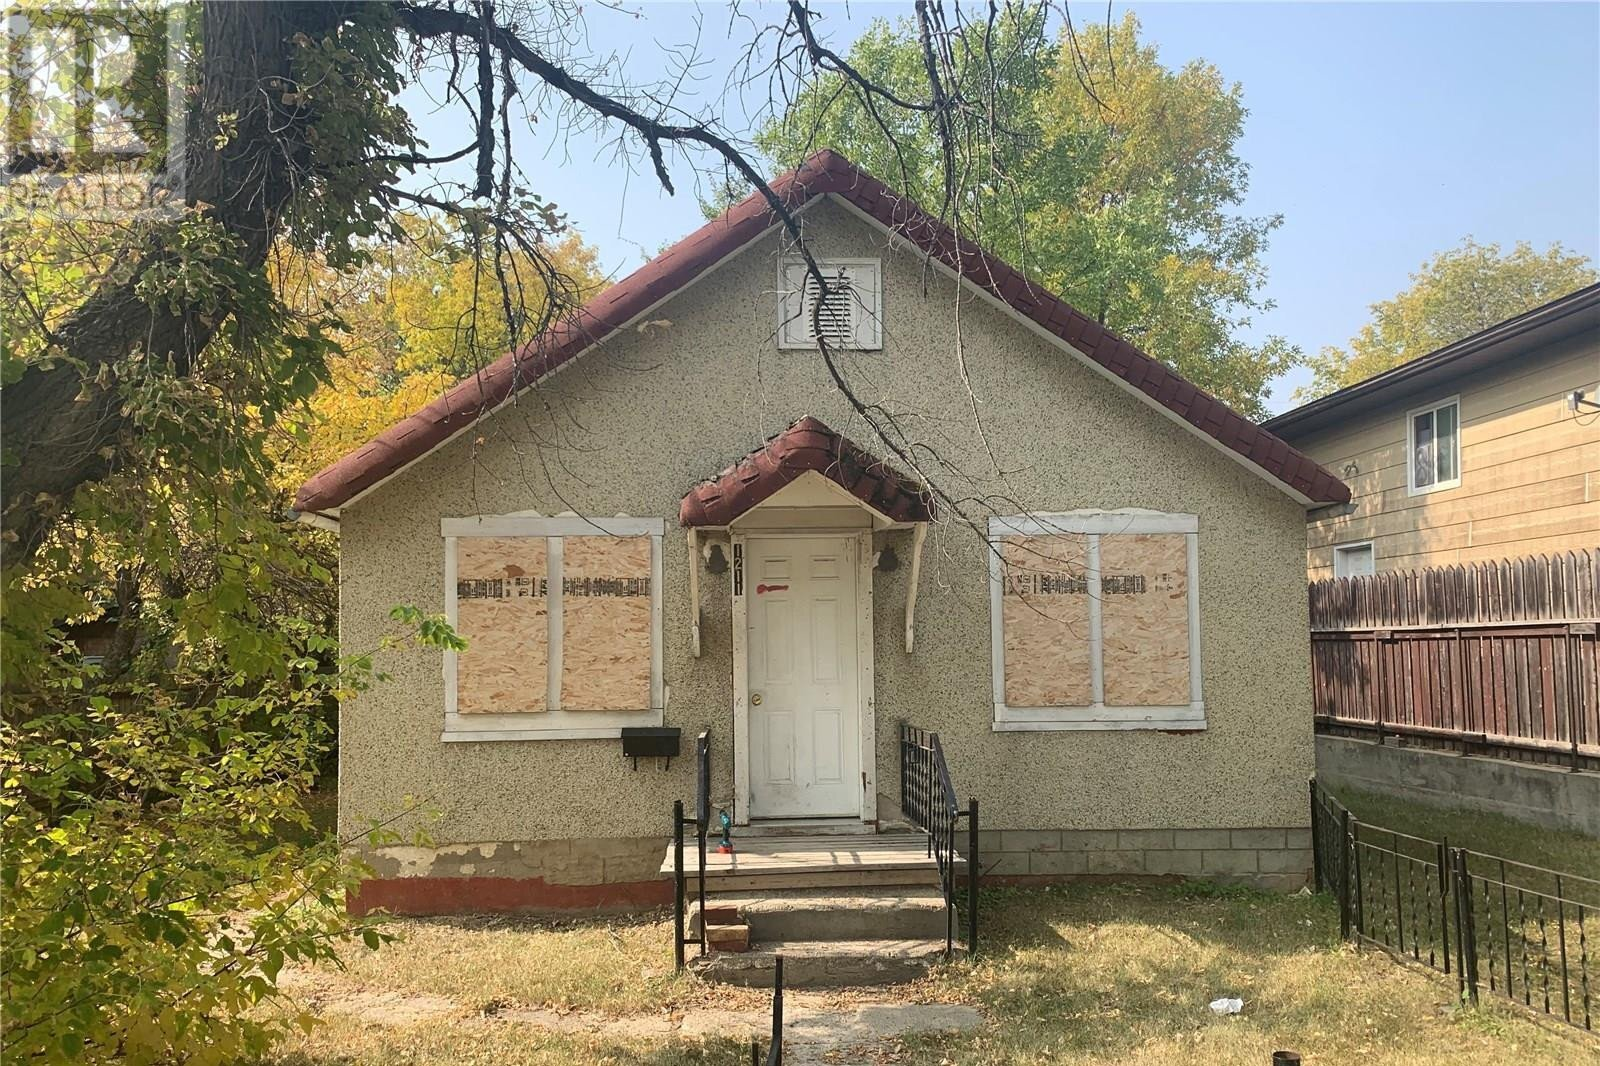 House for sale at 1211 108th St North Battleford Saskatchewan - MLS: SK834423